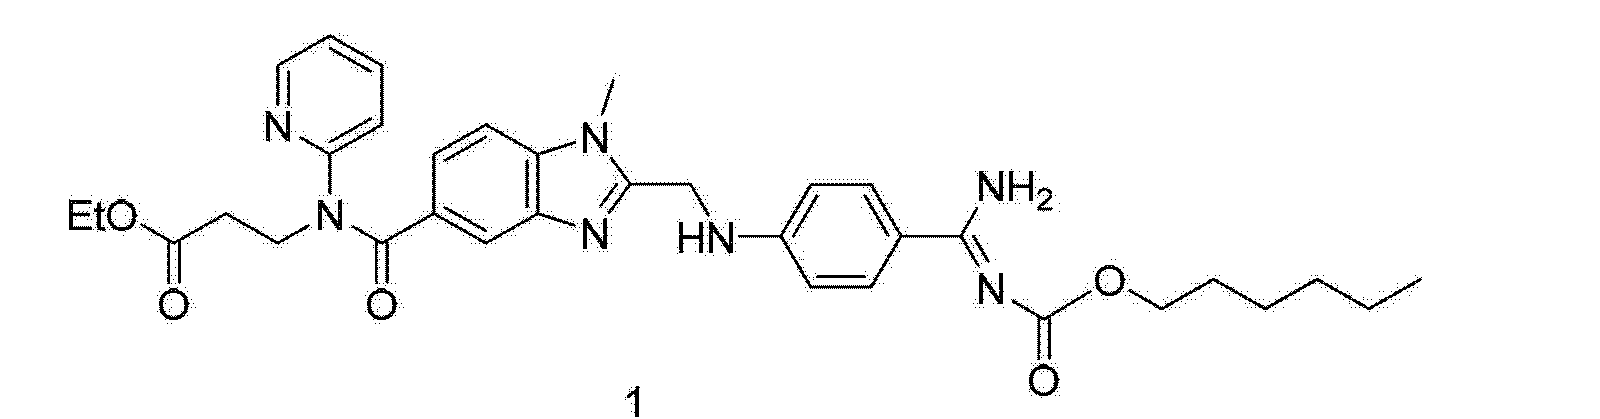 Figure CN102850325AD00031